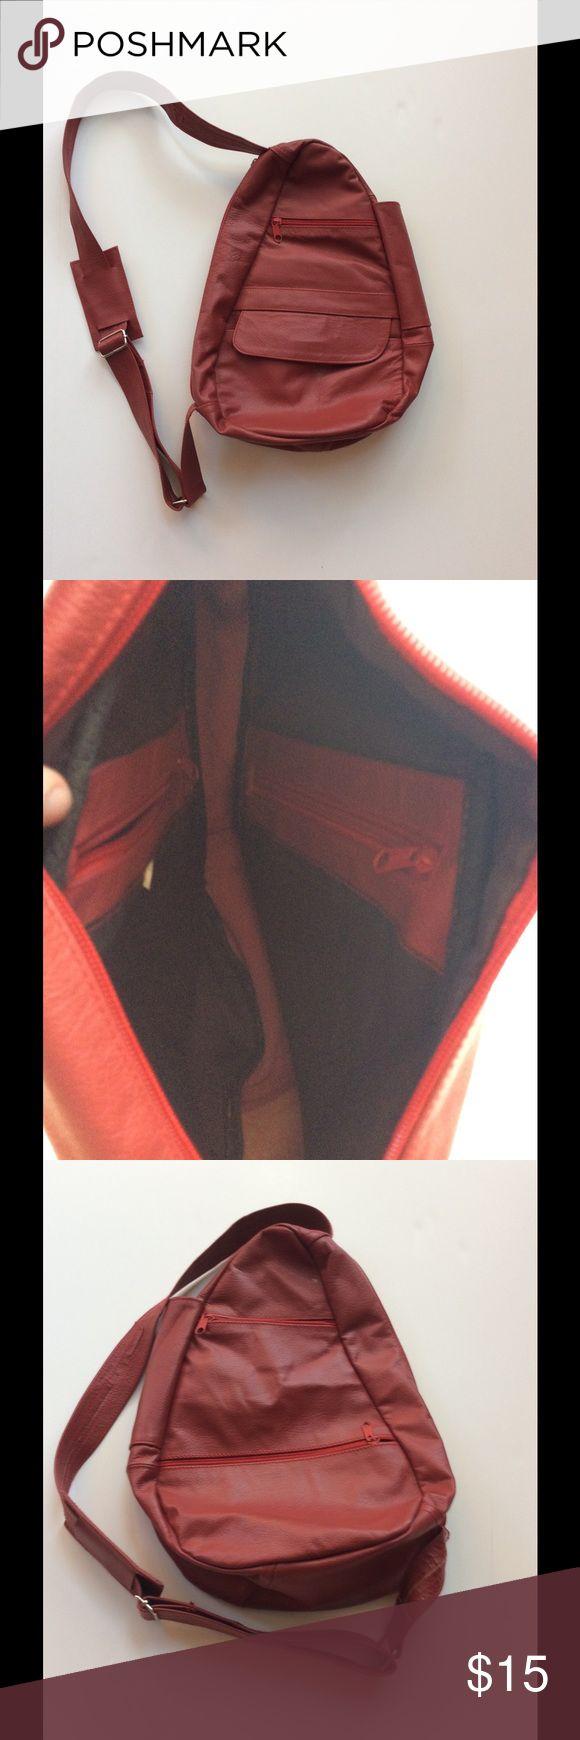 Bags - Sling Bag